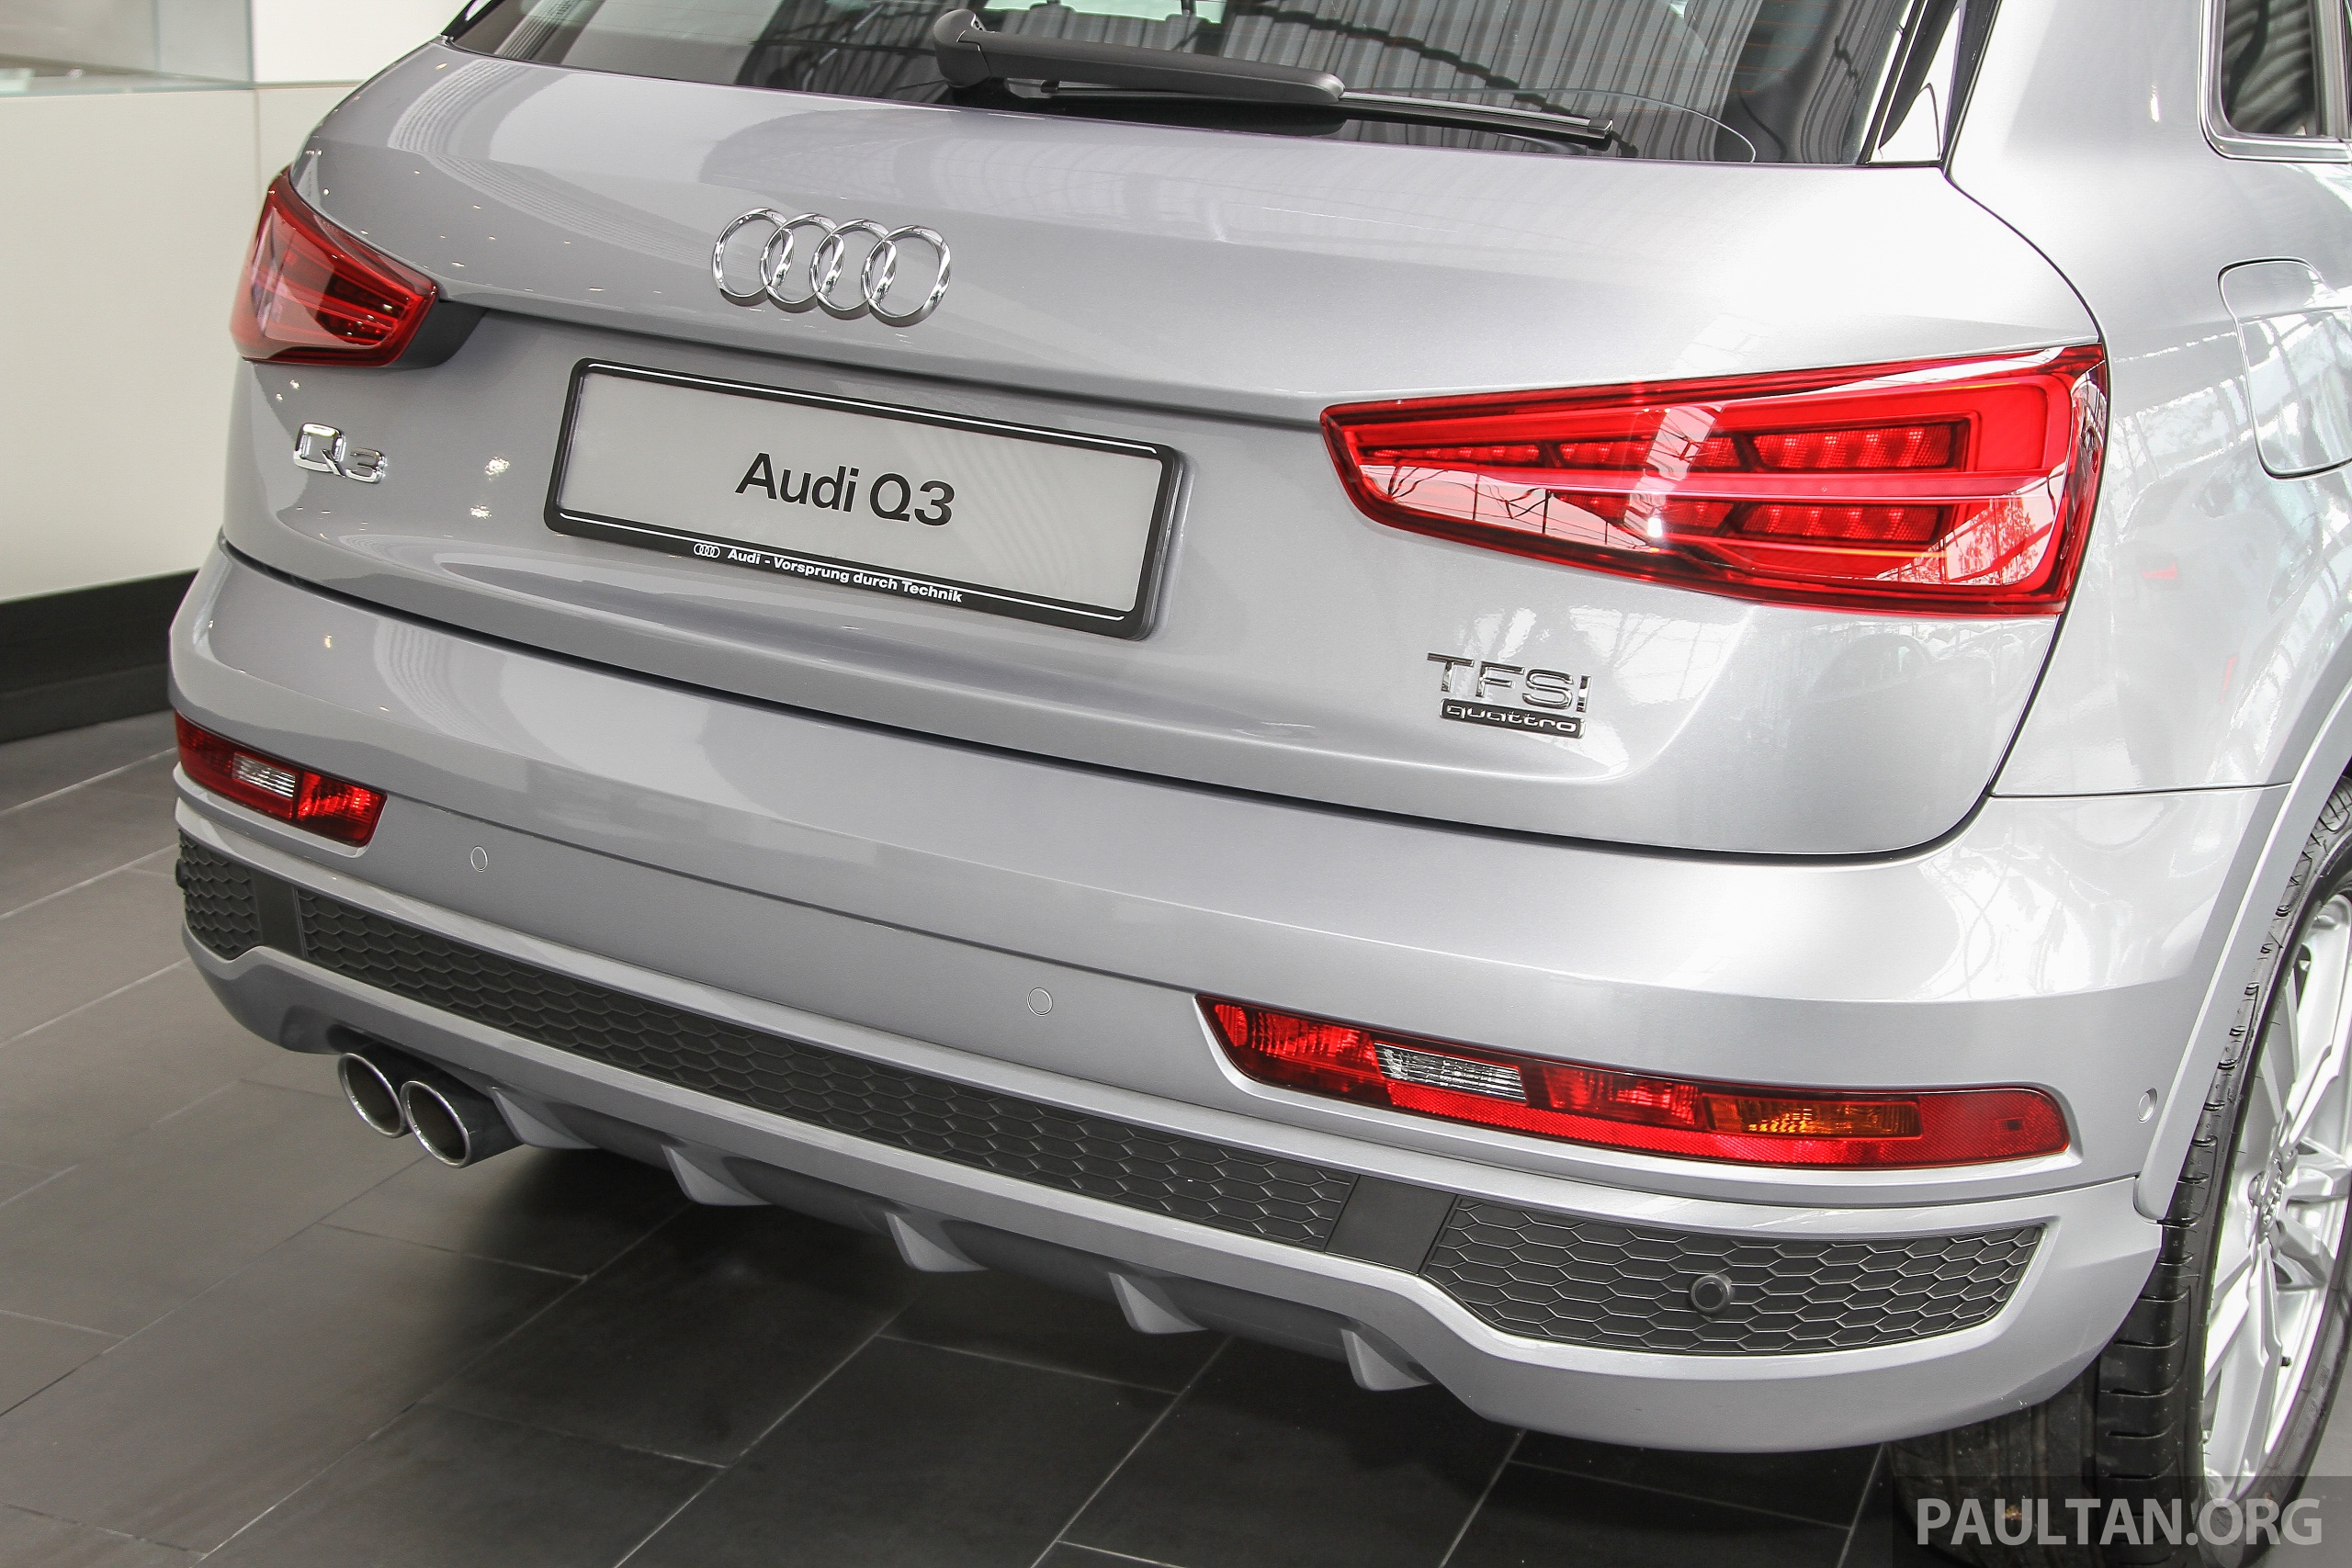 Gallery Audi Q3 Facelift In Malaysian Showroom Paul Tan